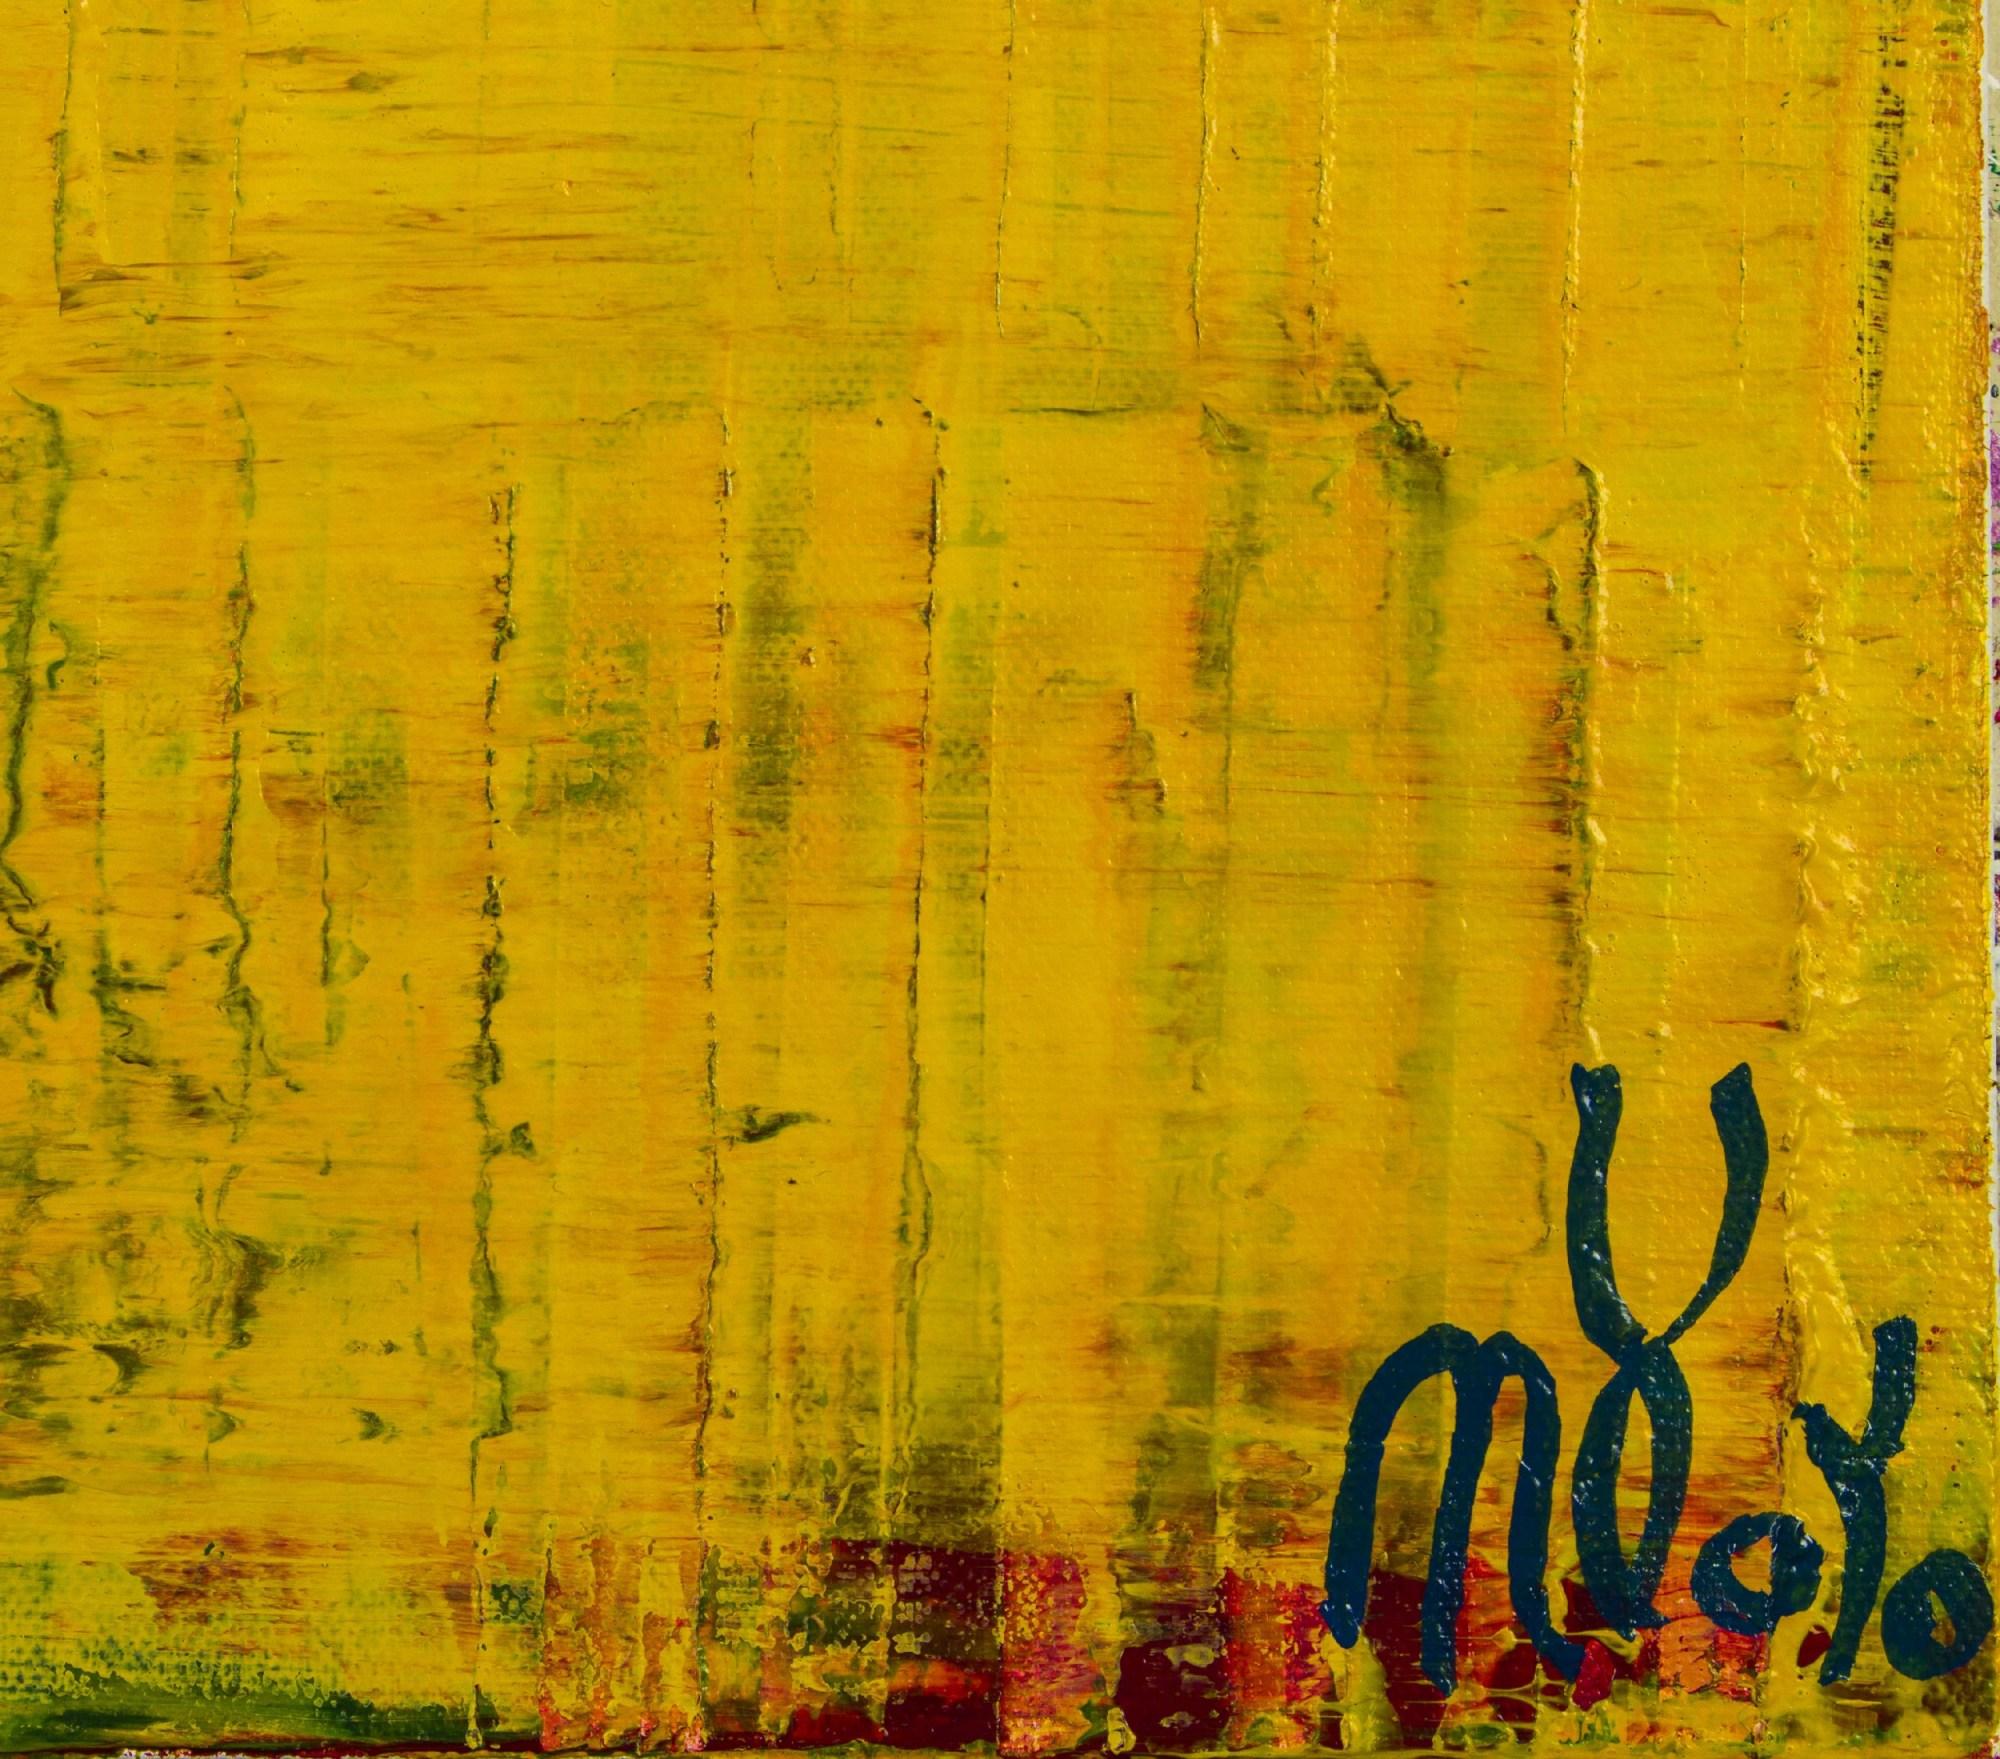 Signature / Yellow Reunion (Lost Lights) (2021) - 24x36 inches /Artist Nestor Toro